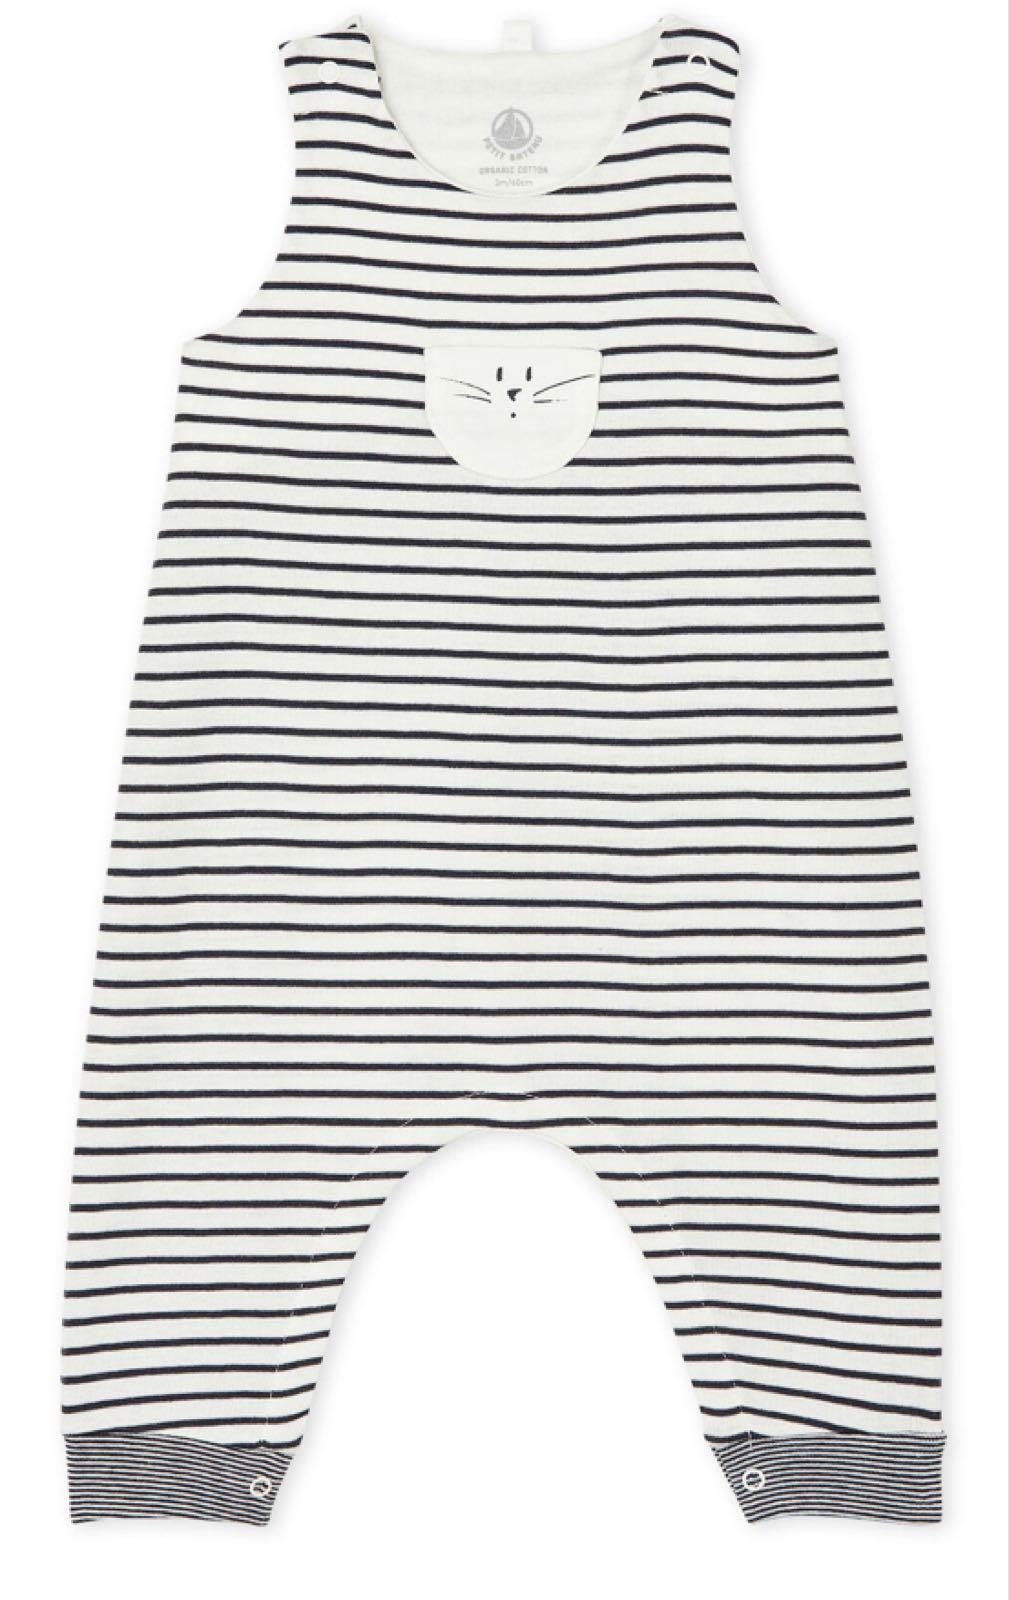 Petit Bateau Unisex Baby's Long Navy Stripe Dungarees